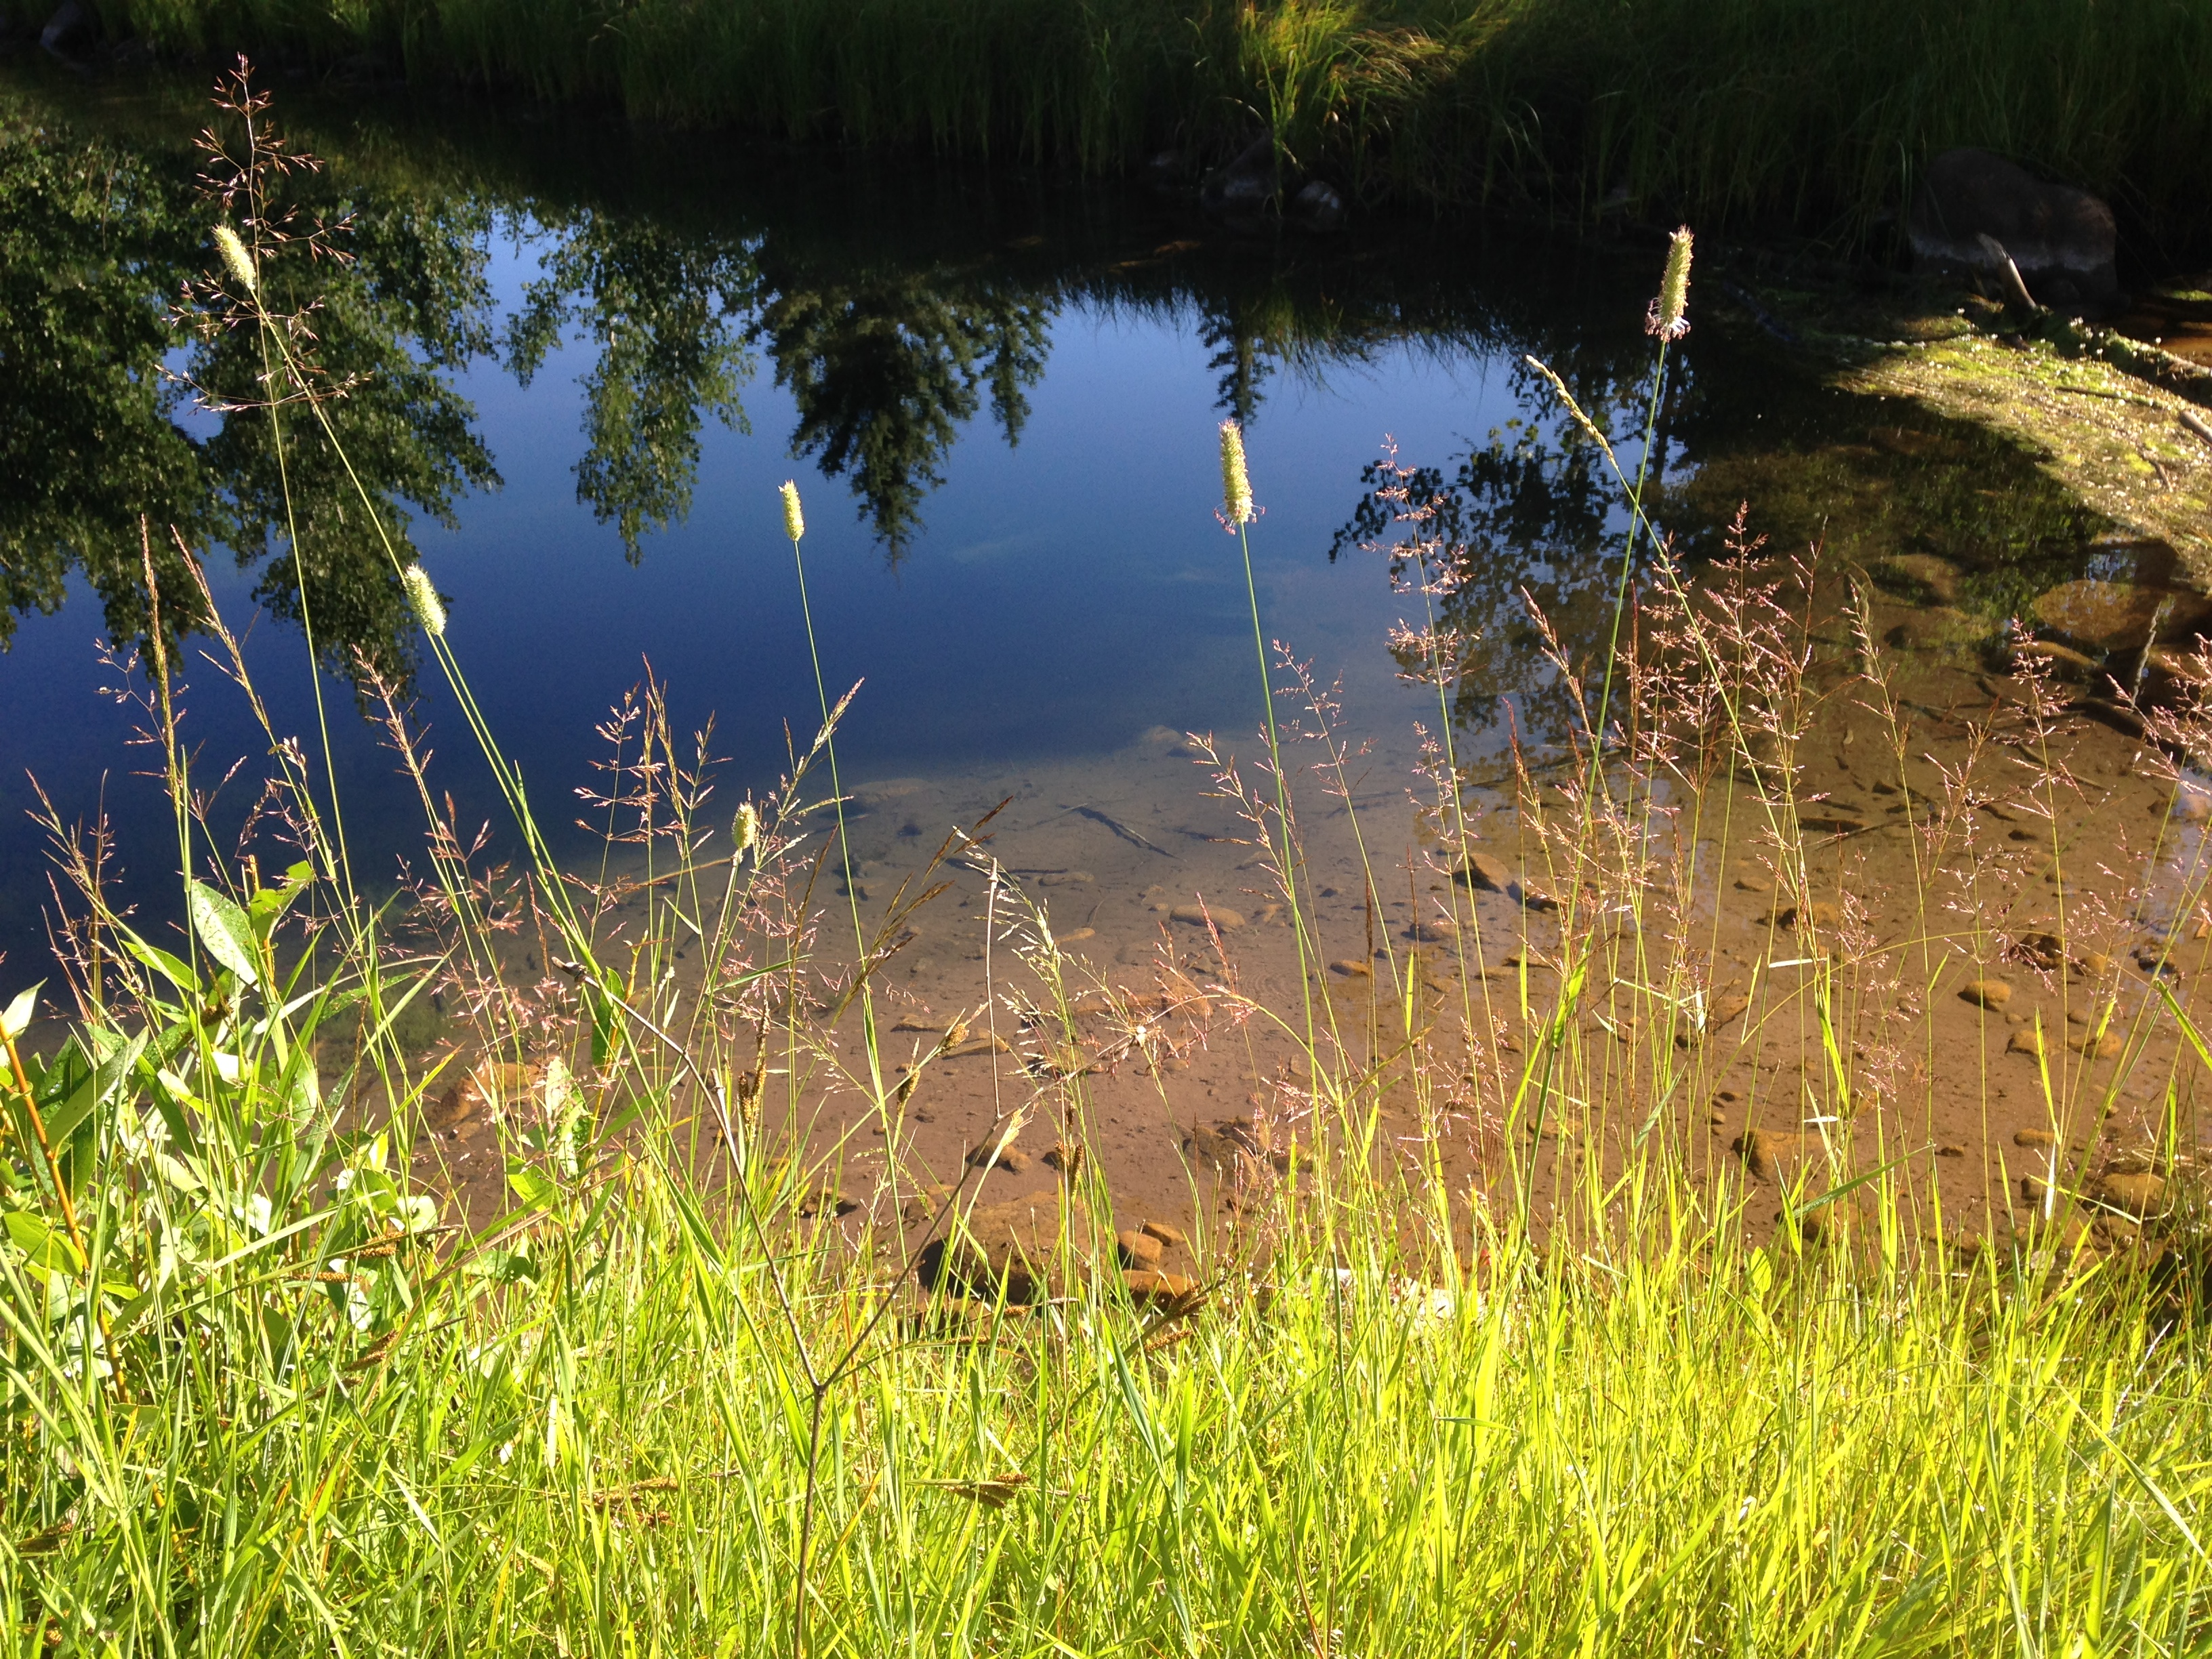 Visit the Ponds